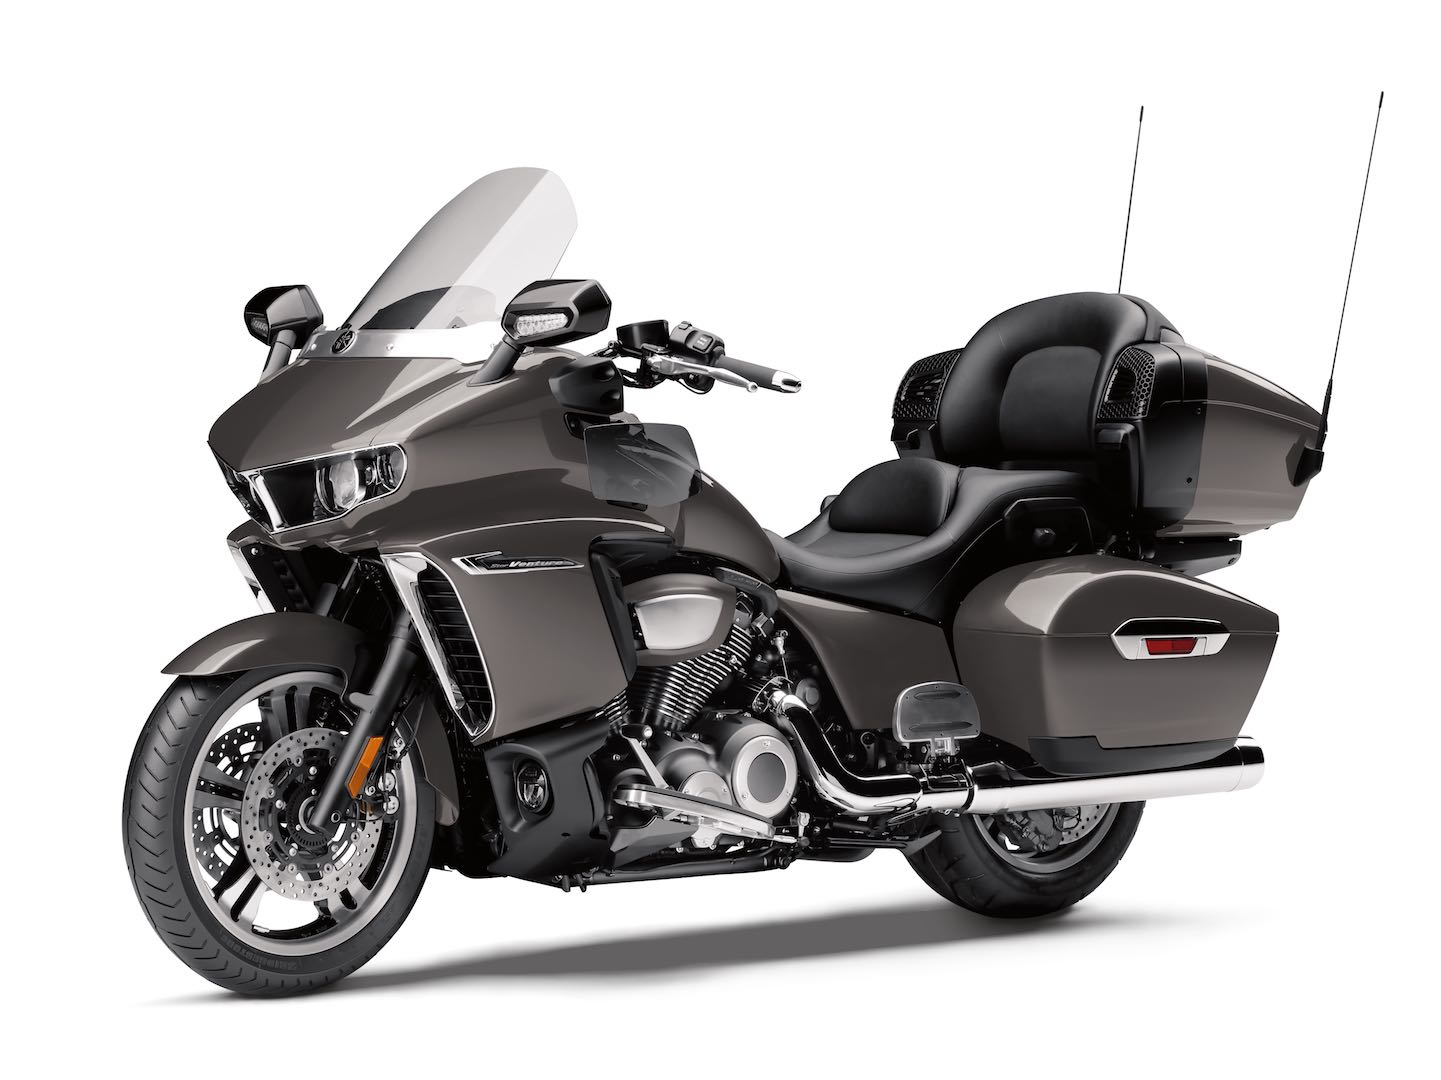 2018 Yamaha Star Venture Preview